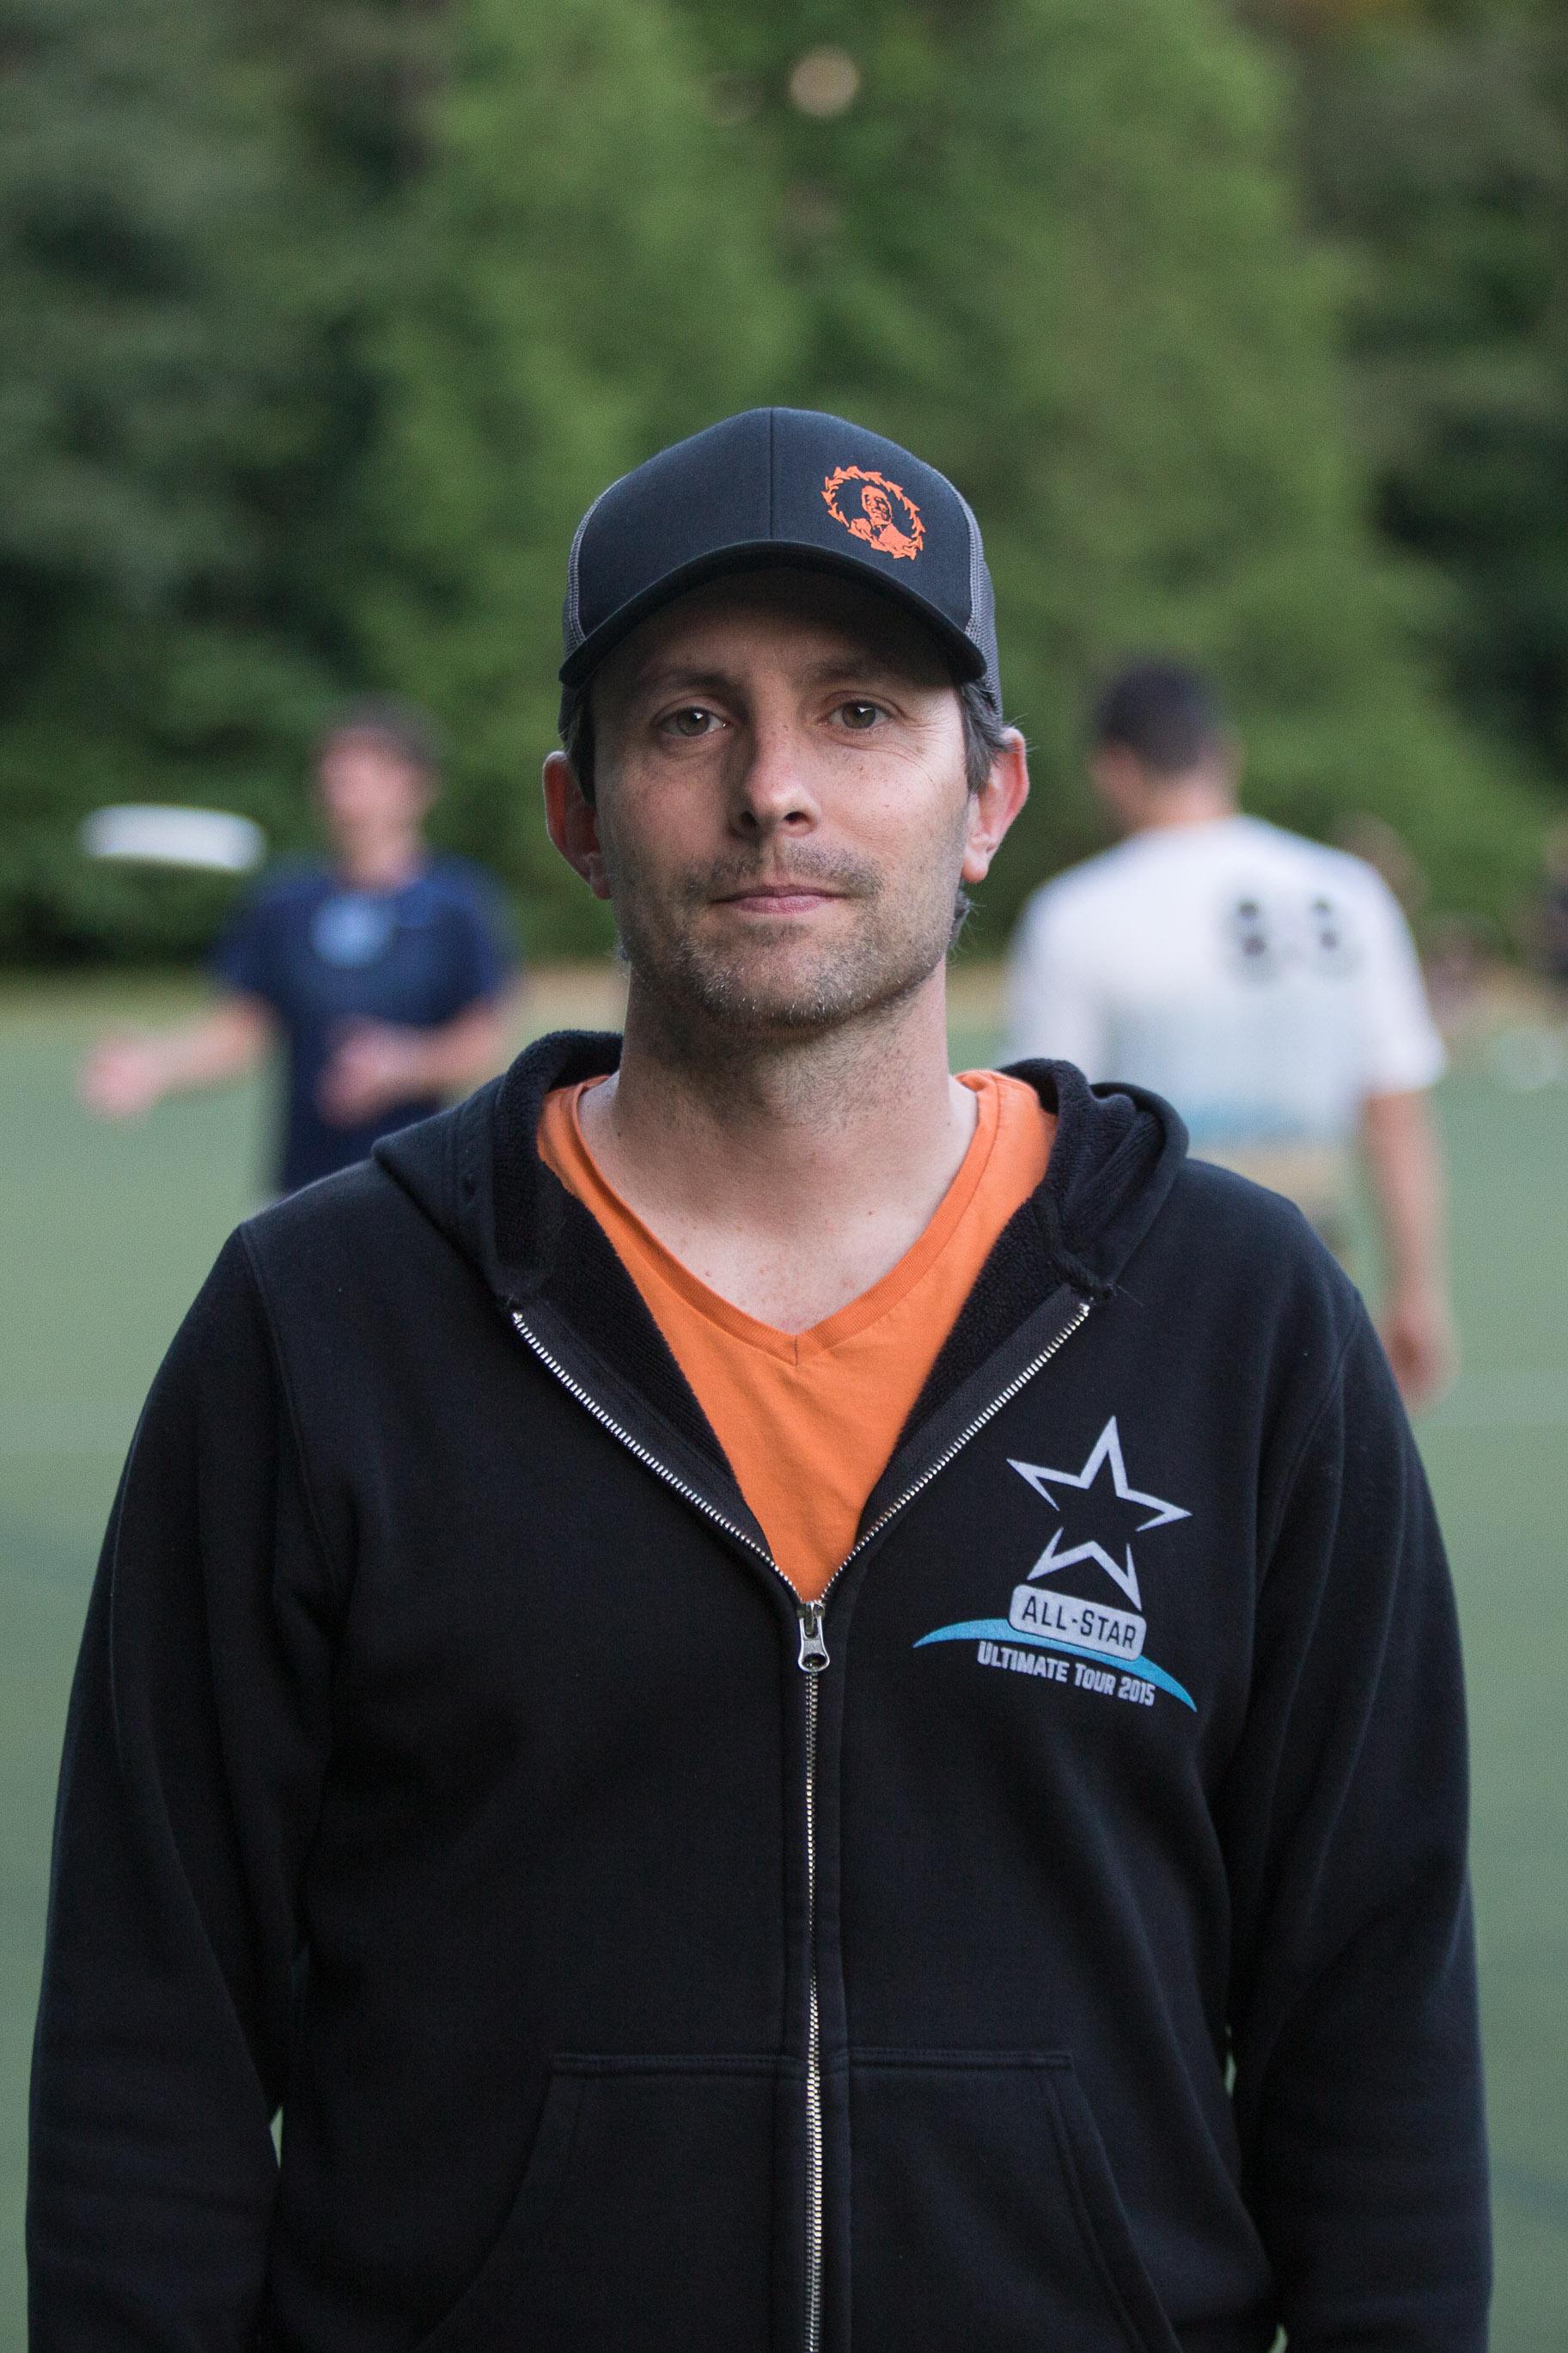 Mike Denardis, Head coach of Darkside